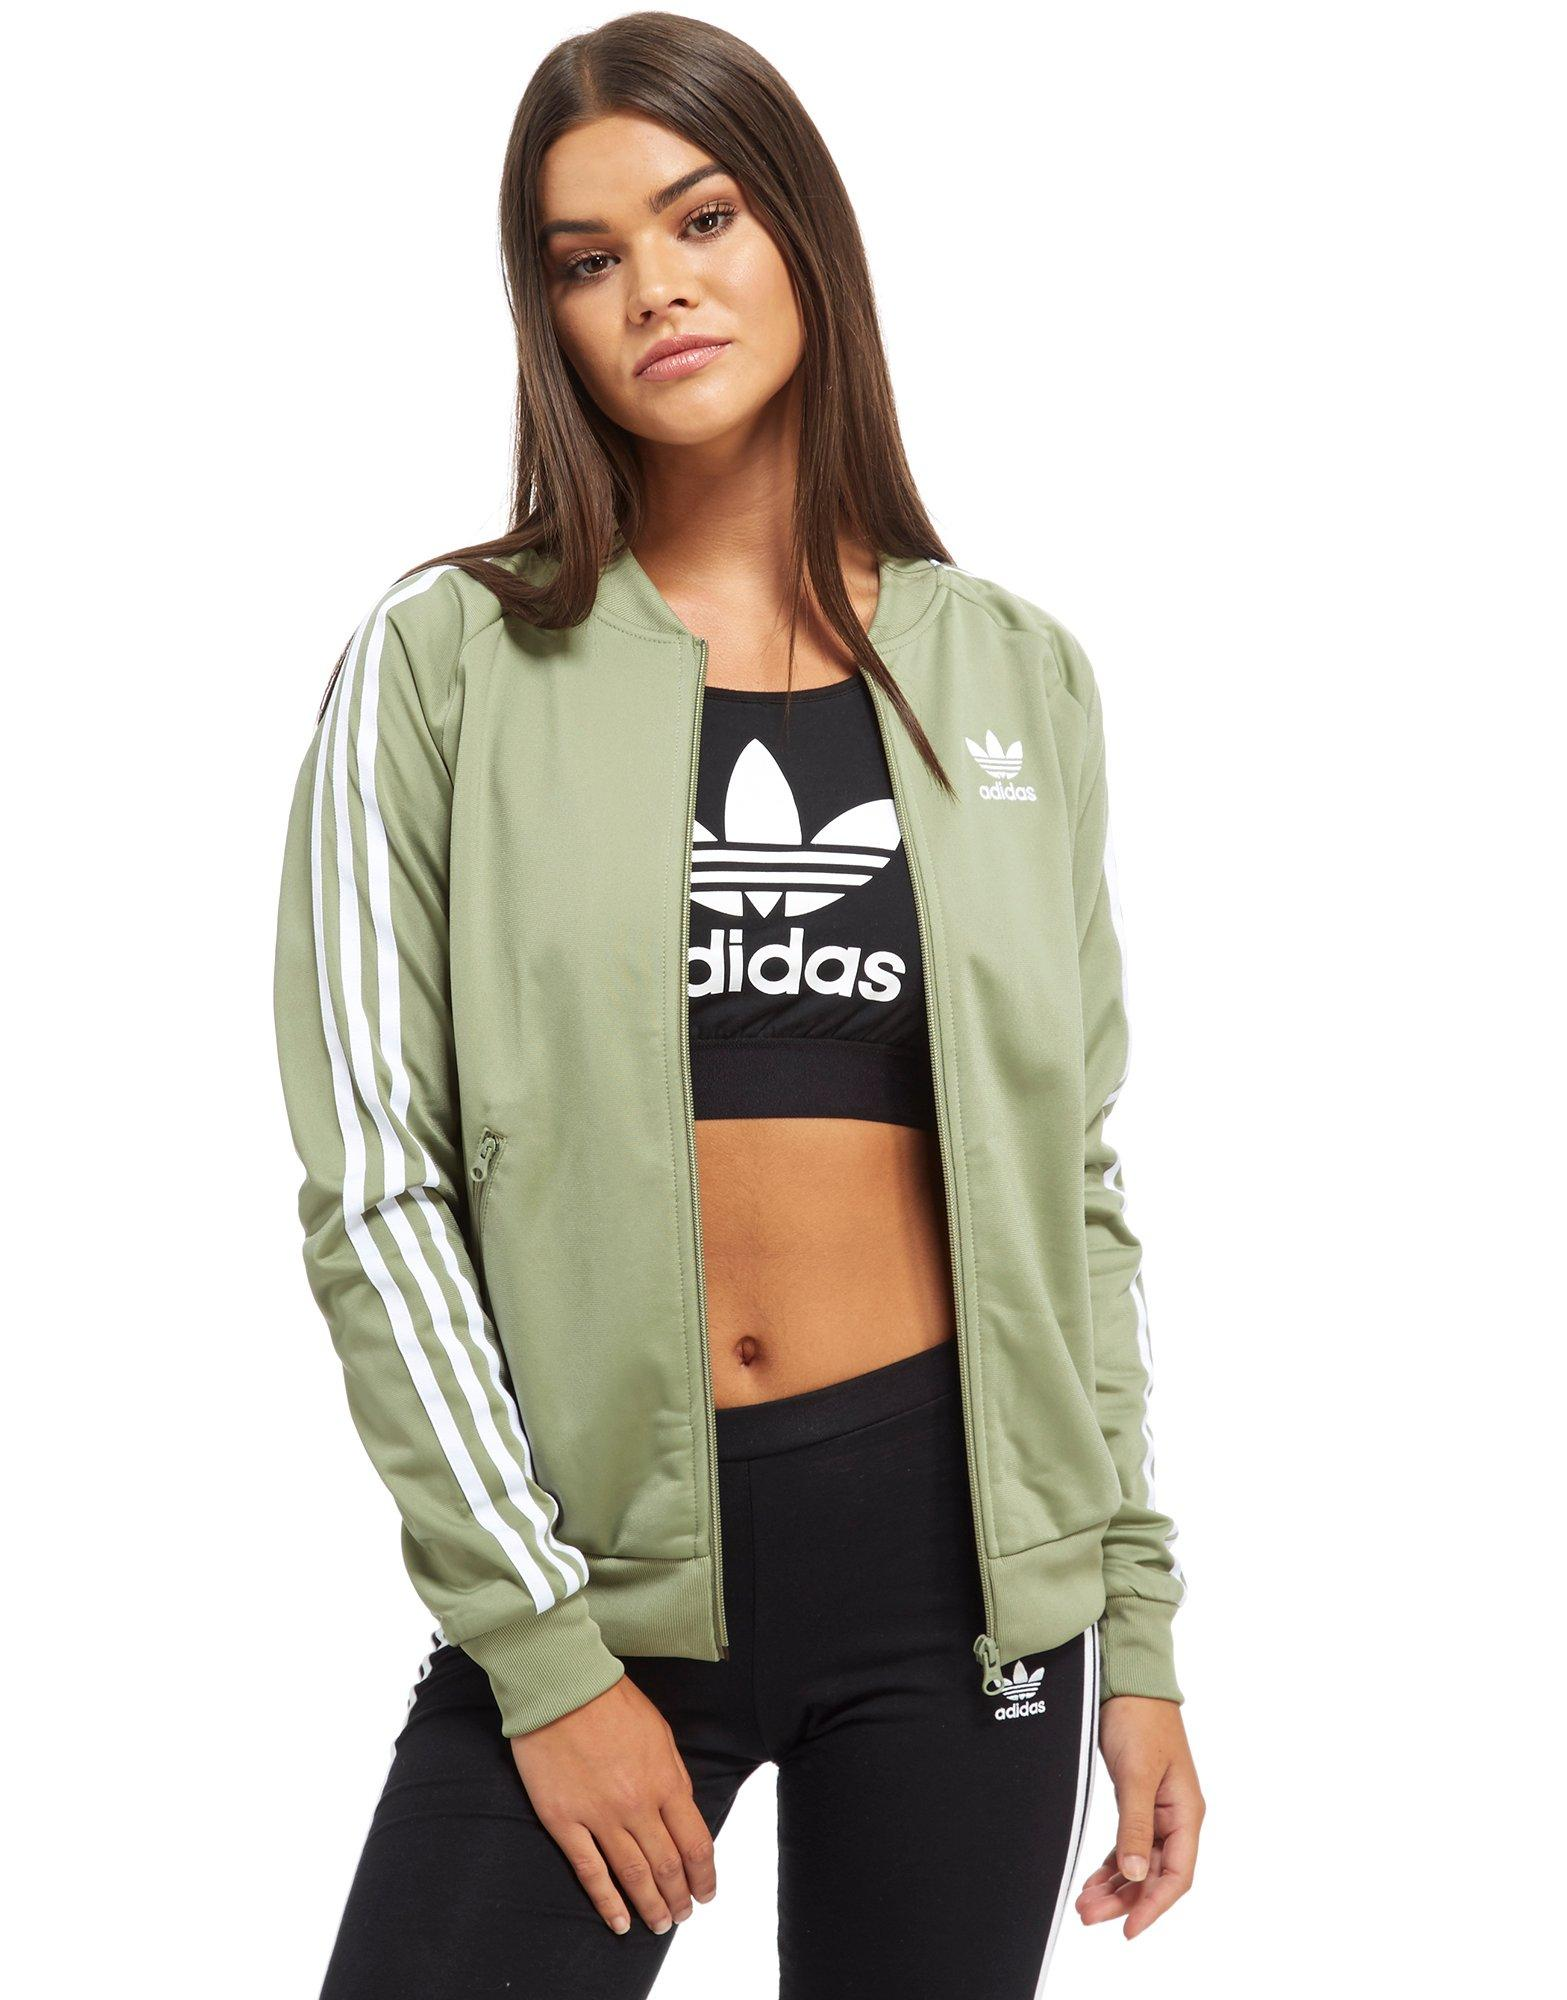 adidas clothes womens